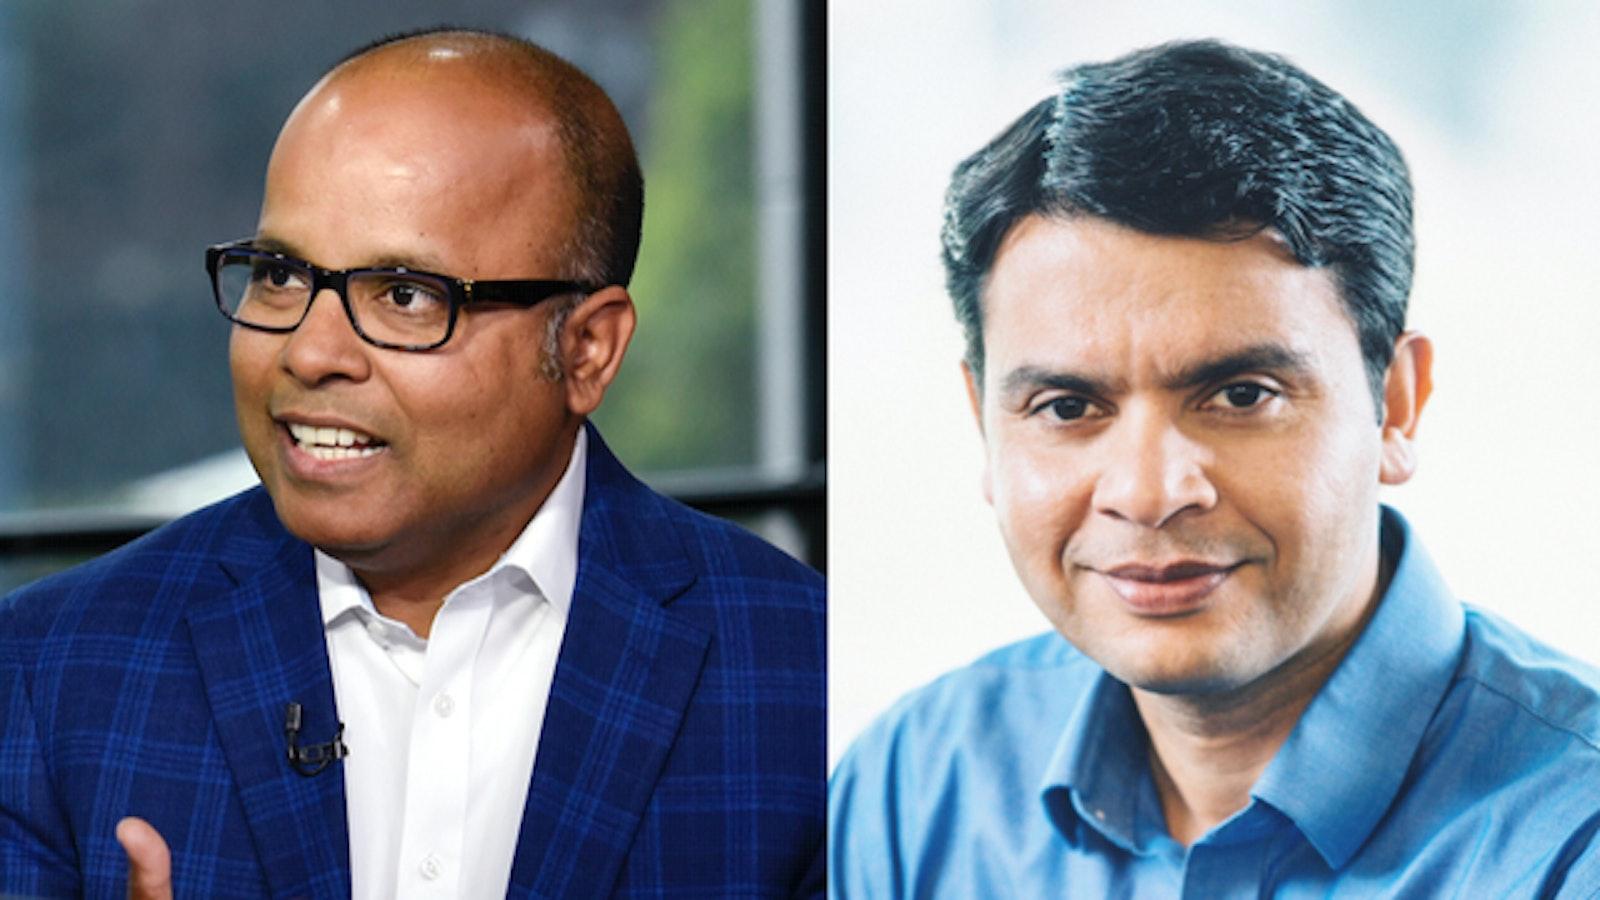 Rubrik CEO Bipul Sinha and Cohesity CEO Mohit Aron. Photos by Bloomberg (Sinha), Cohesity (Aron)